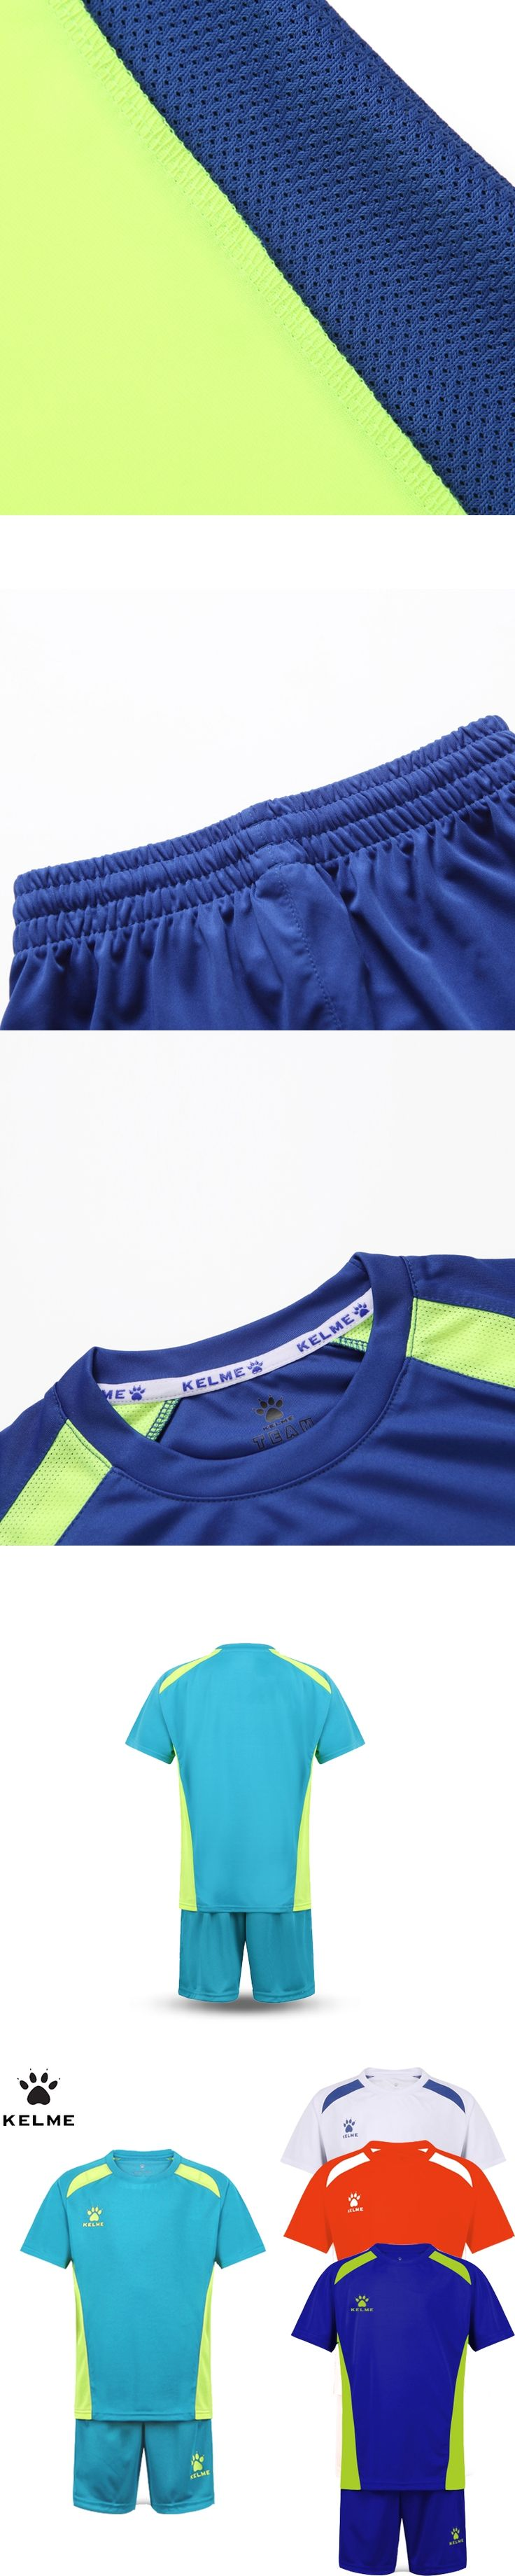 KELME Children Soccer Sets Boys Summer Football Jerseys Clothing Set 2pcs Sportswear Suit For Kids Uniform Survetement Sports